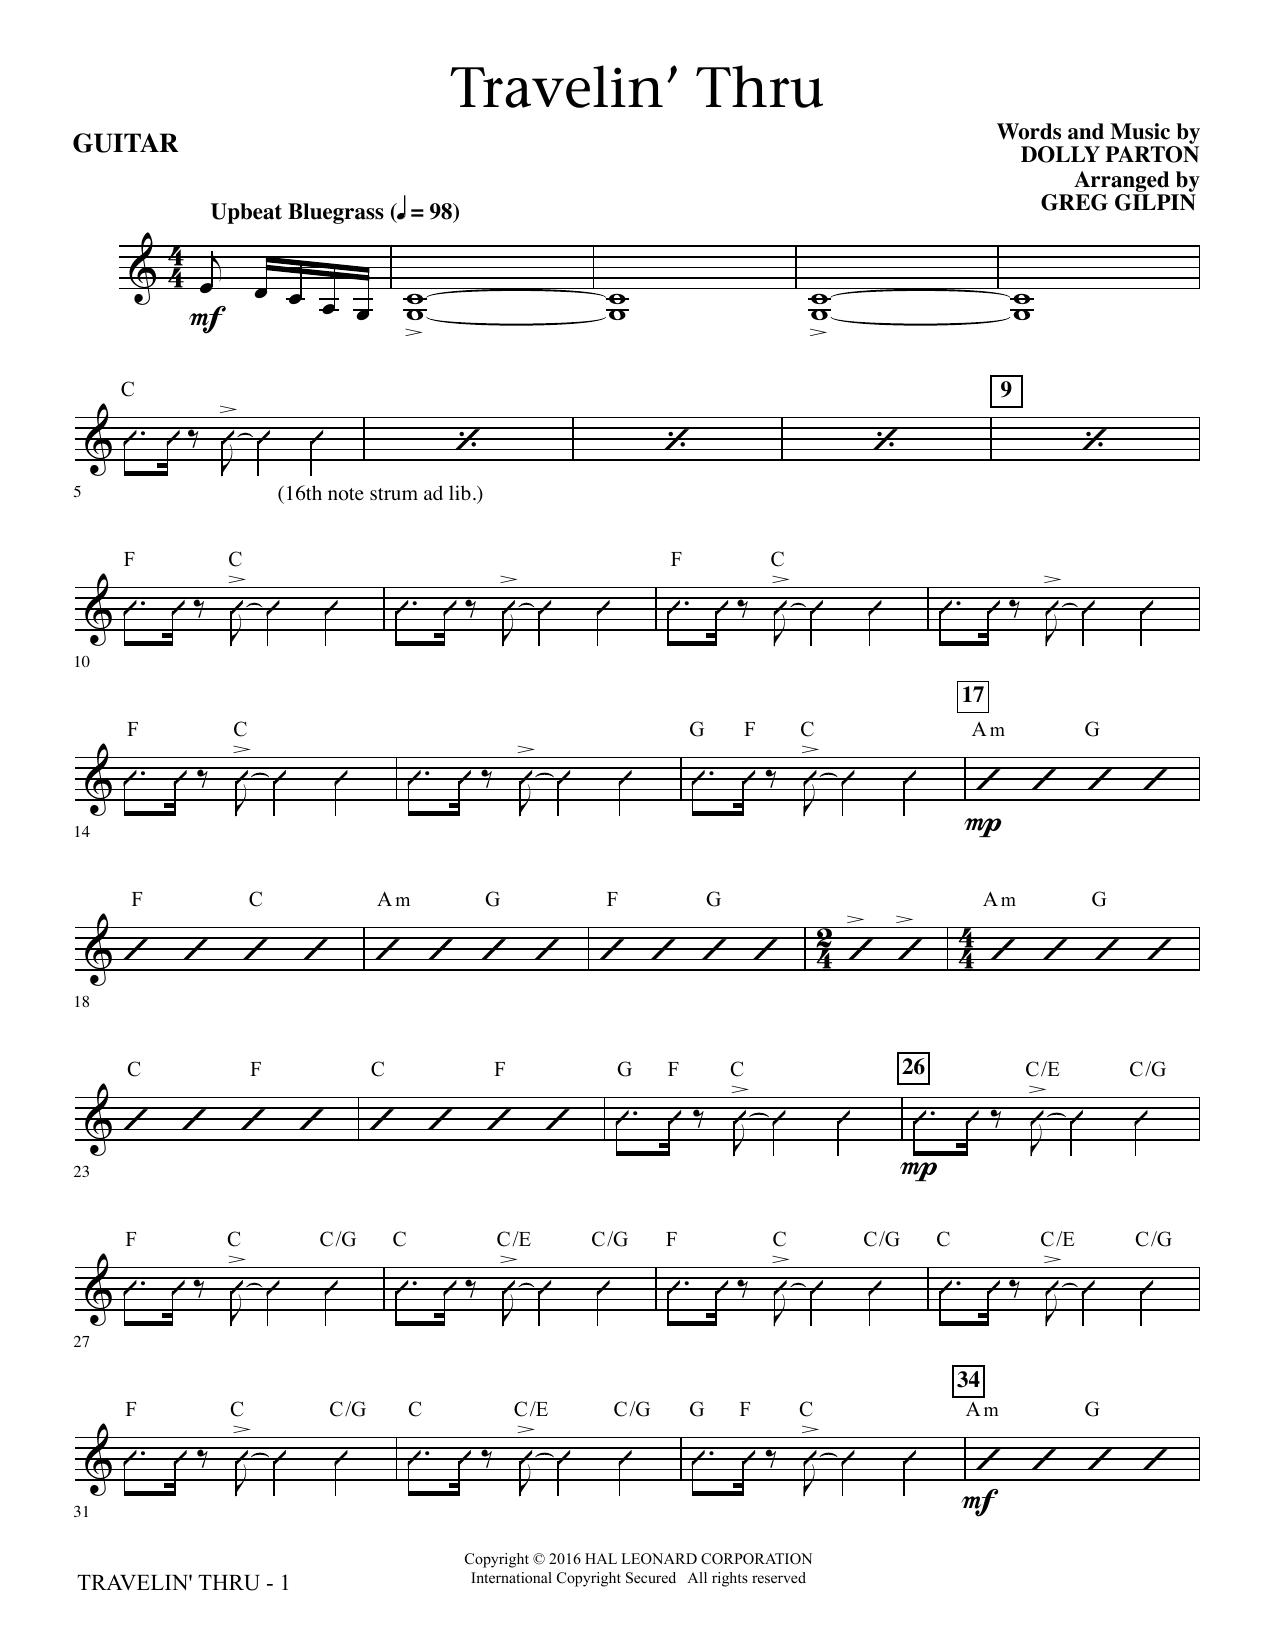 Travelin' Thru - Guitar Sheet Music